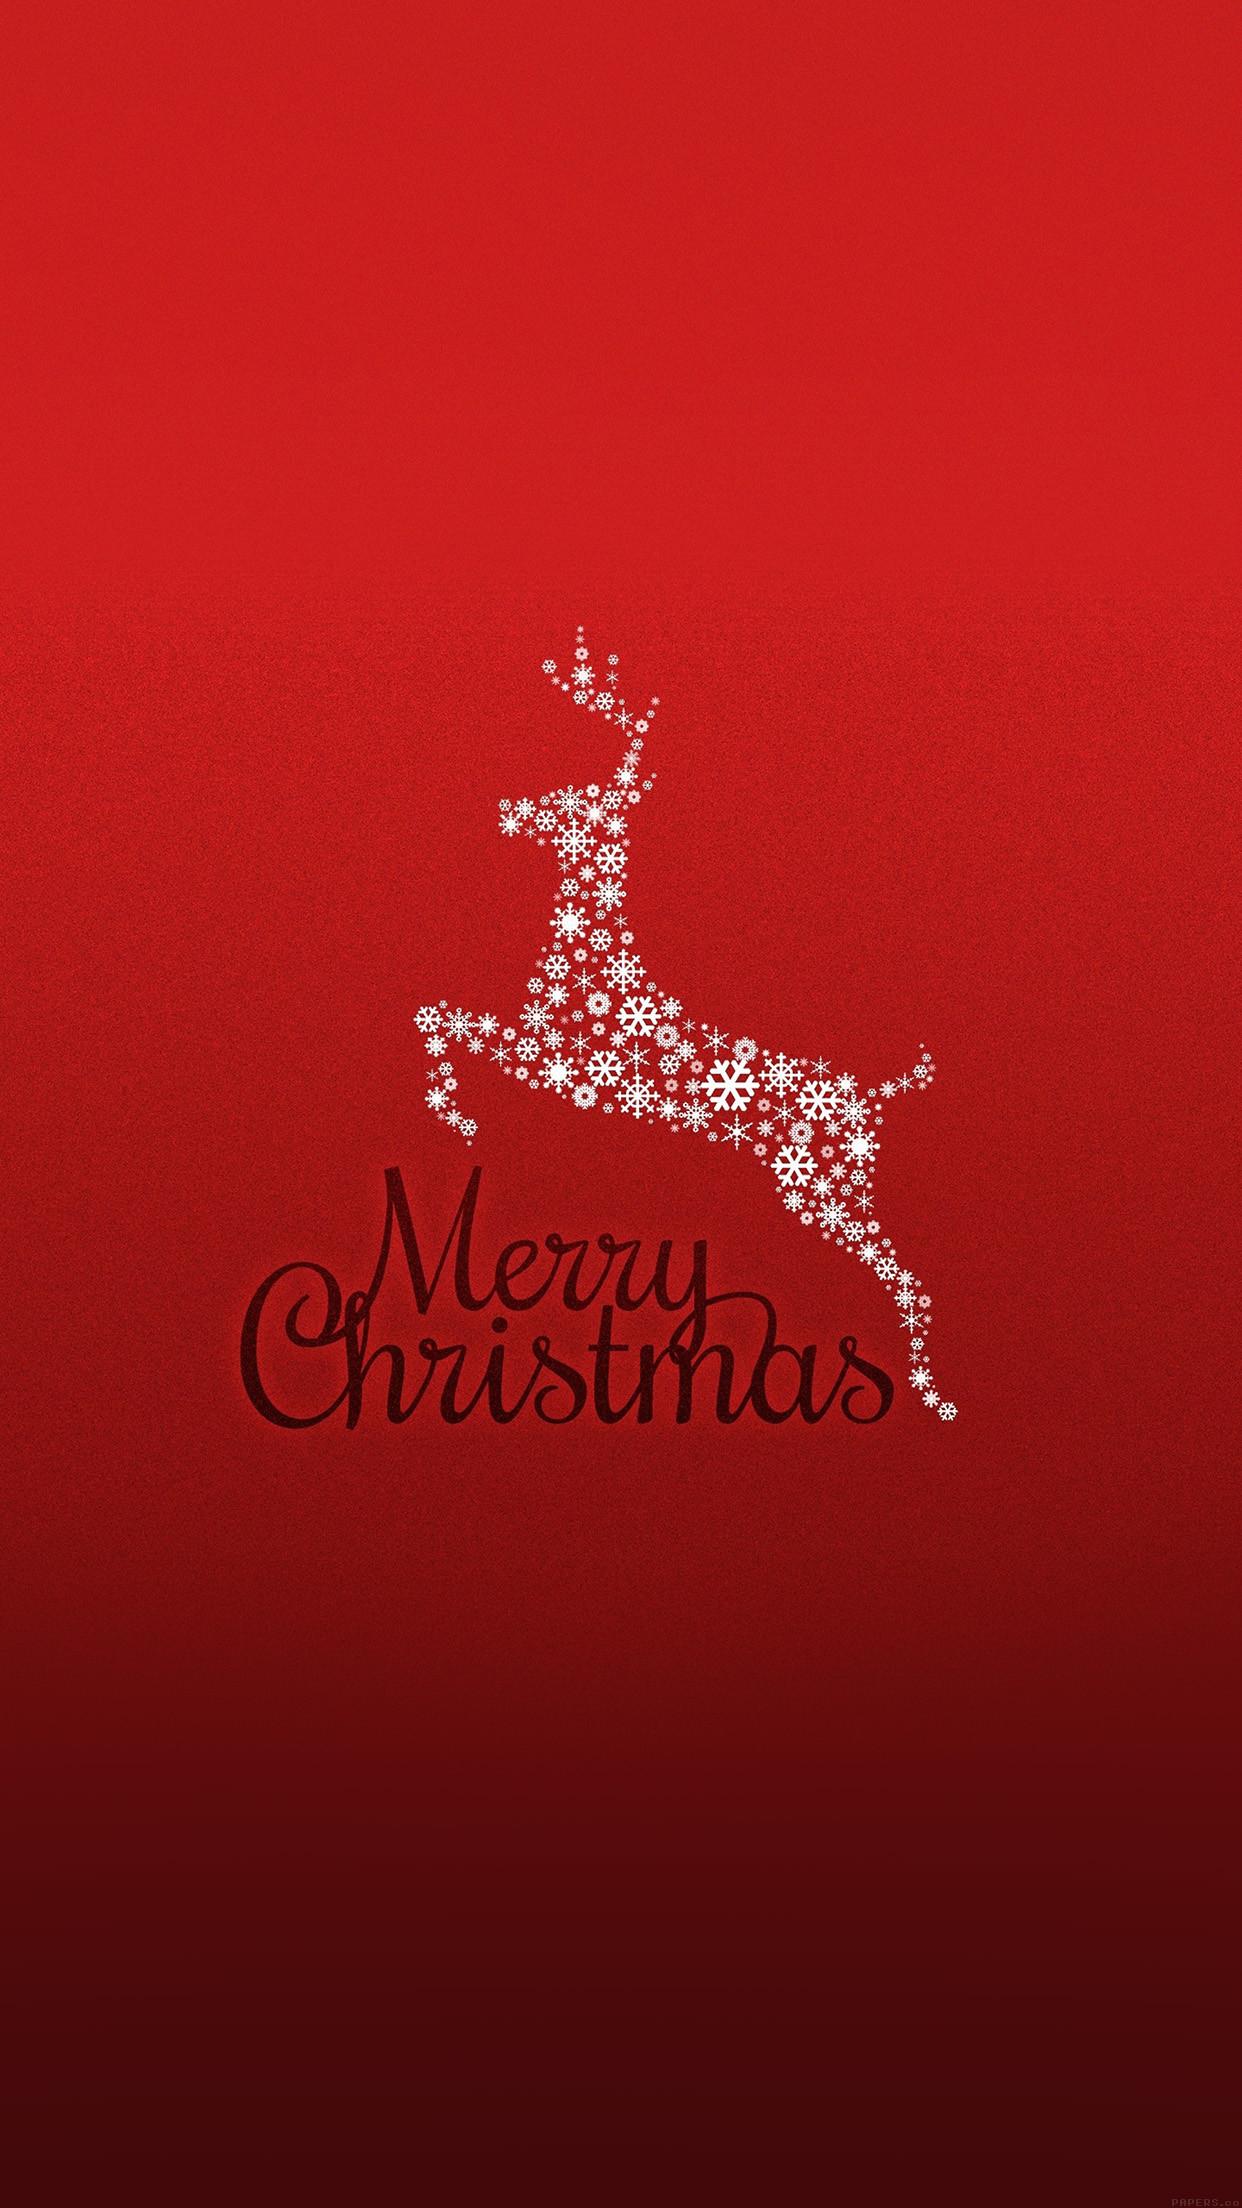 holiday-spirit-minimal-christmas-art-9-wallpaper